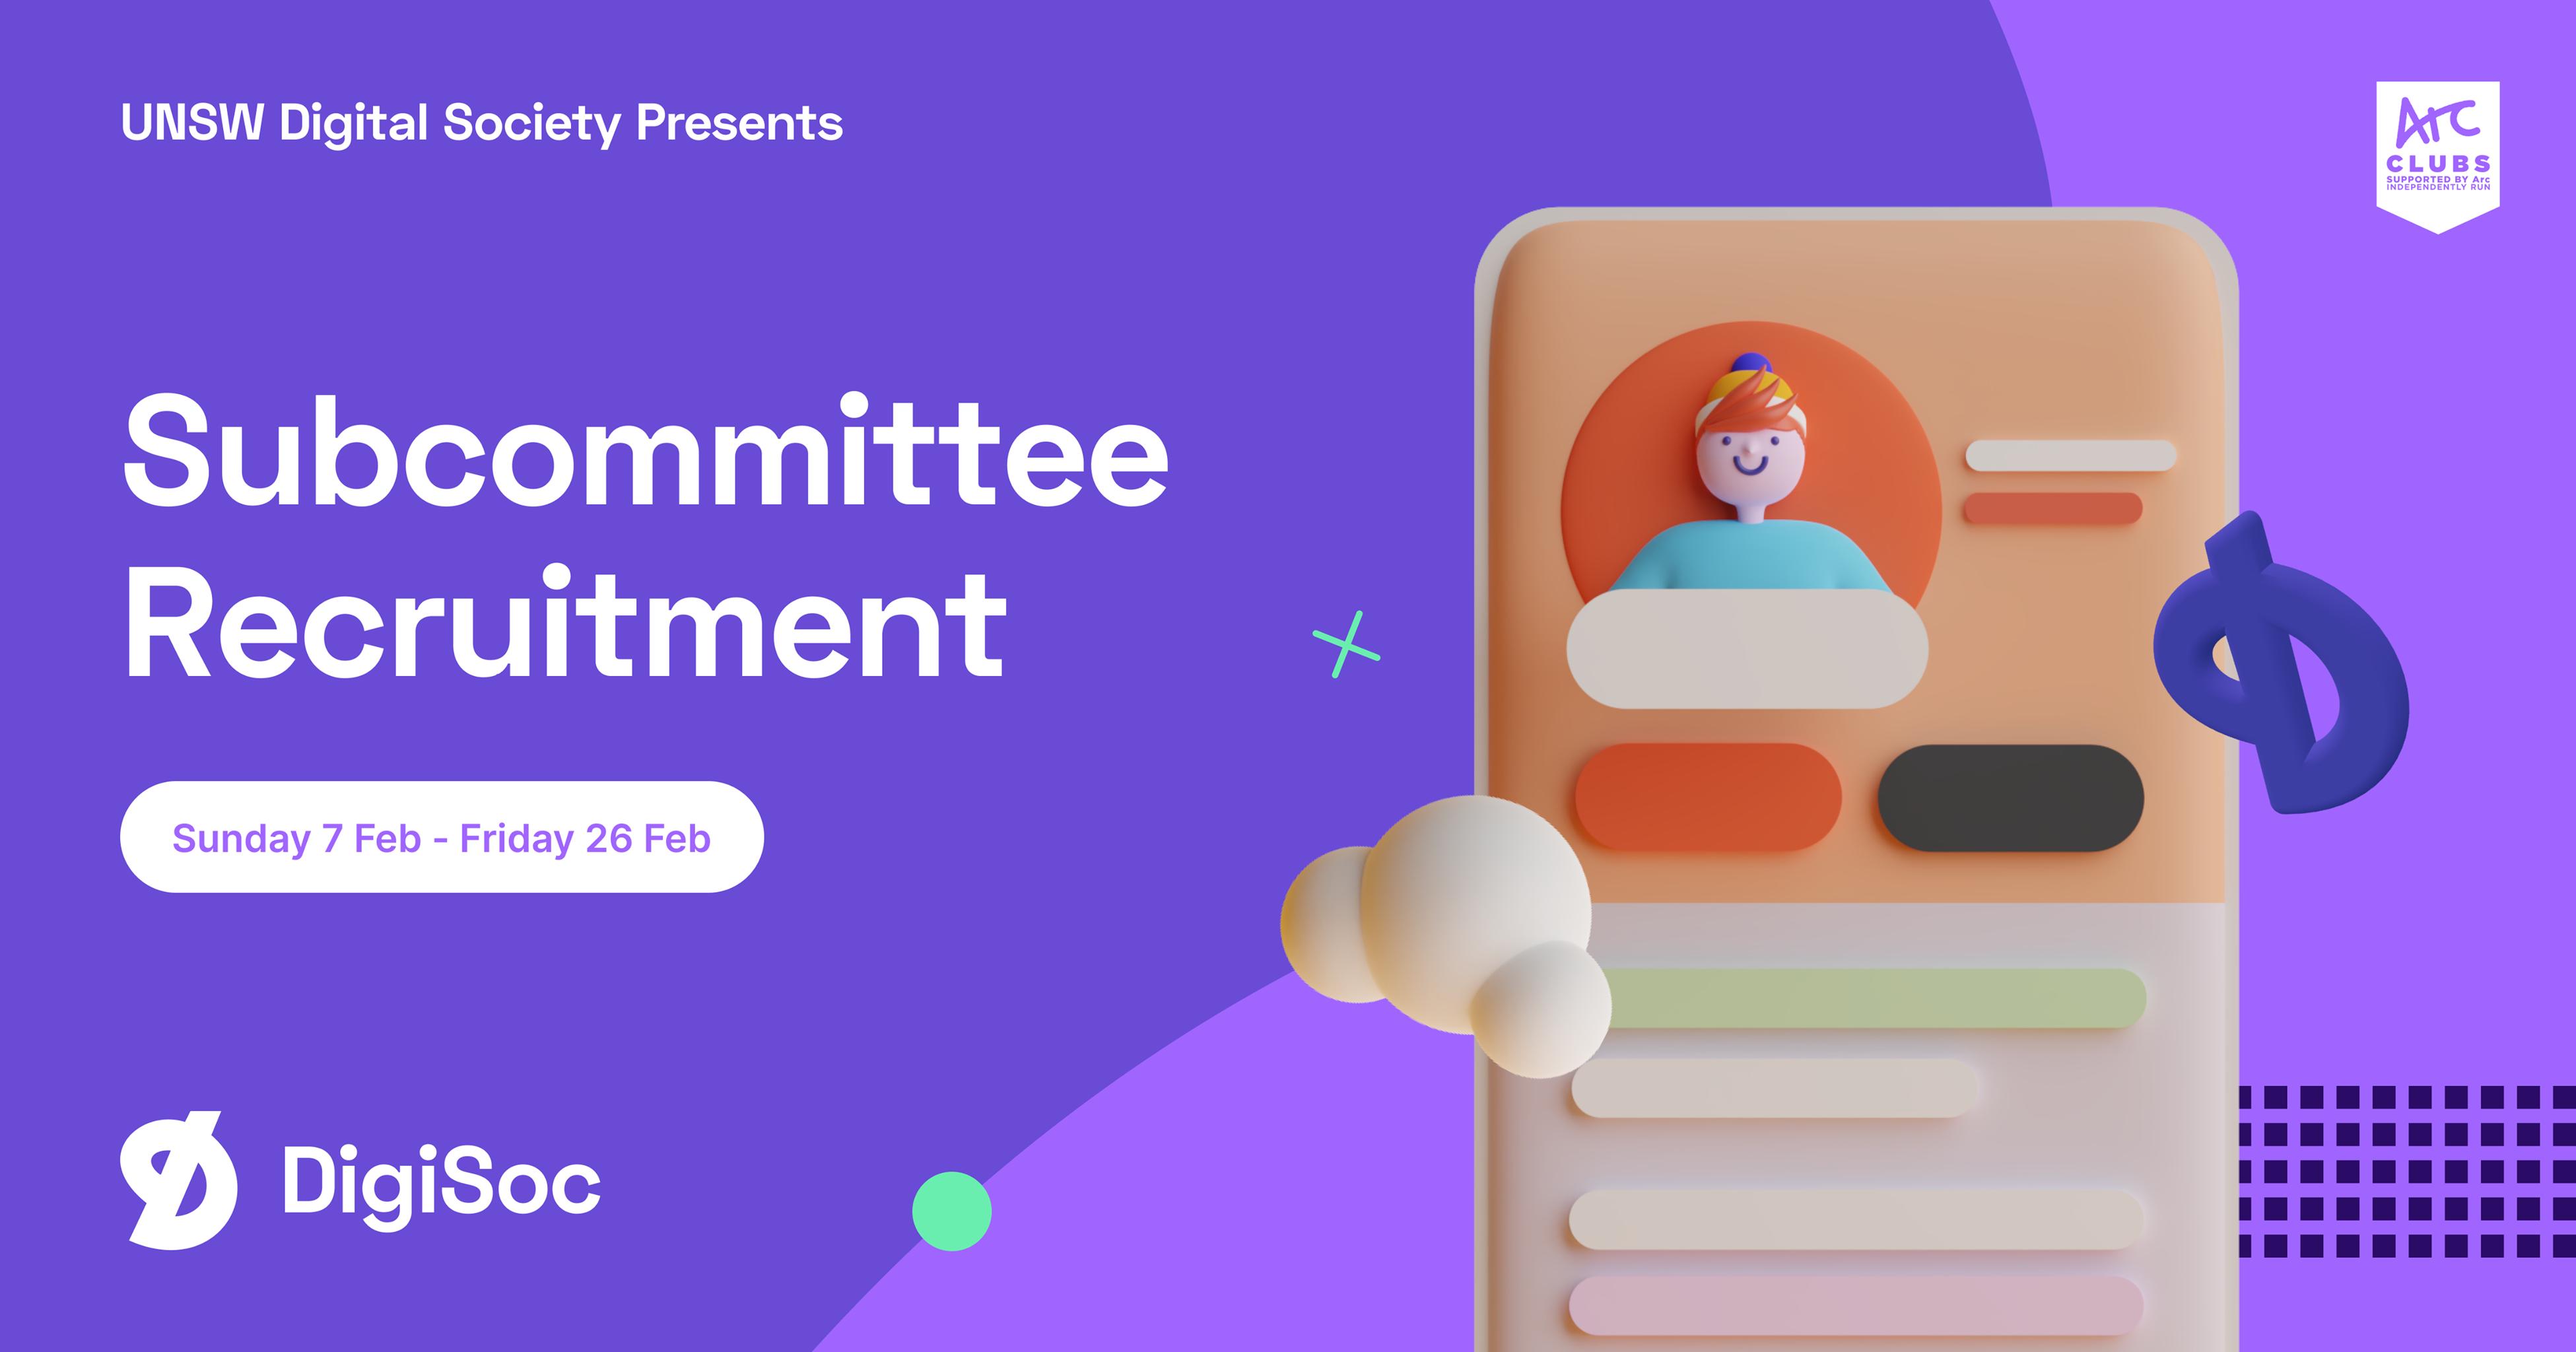 DigiSoc Presents: Subcommittee Recruitment